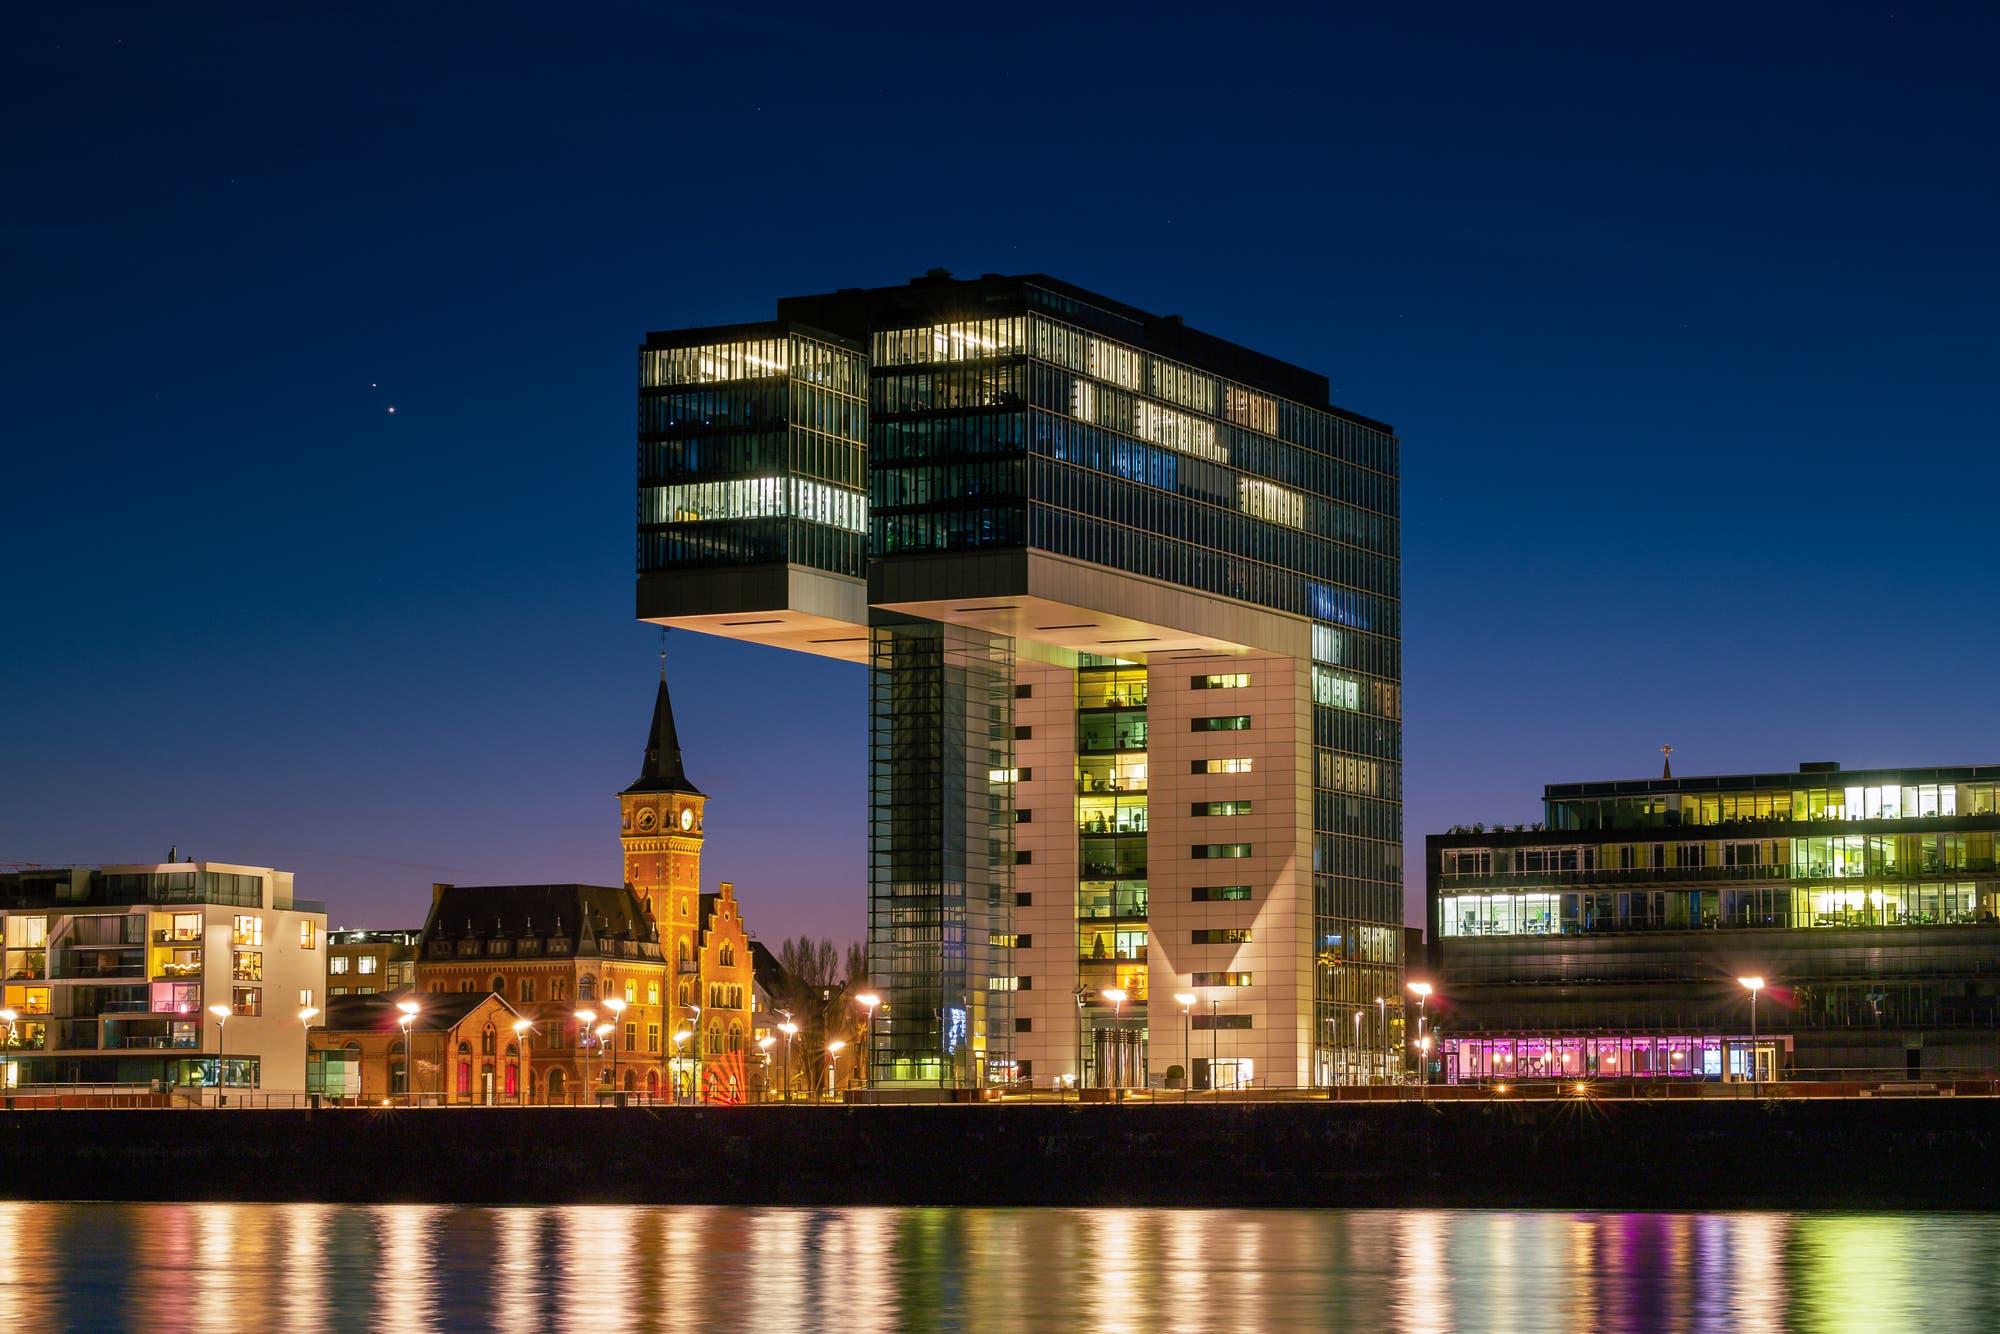 Kranhäuser in Köln mit Planeten II